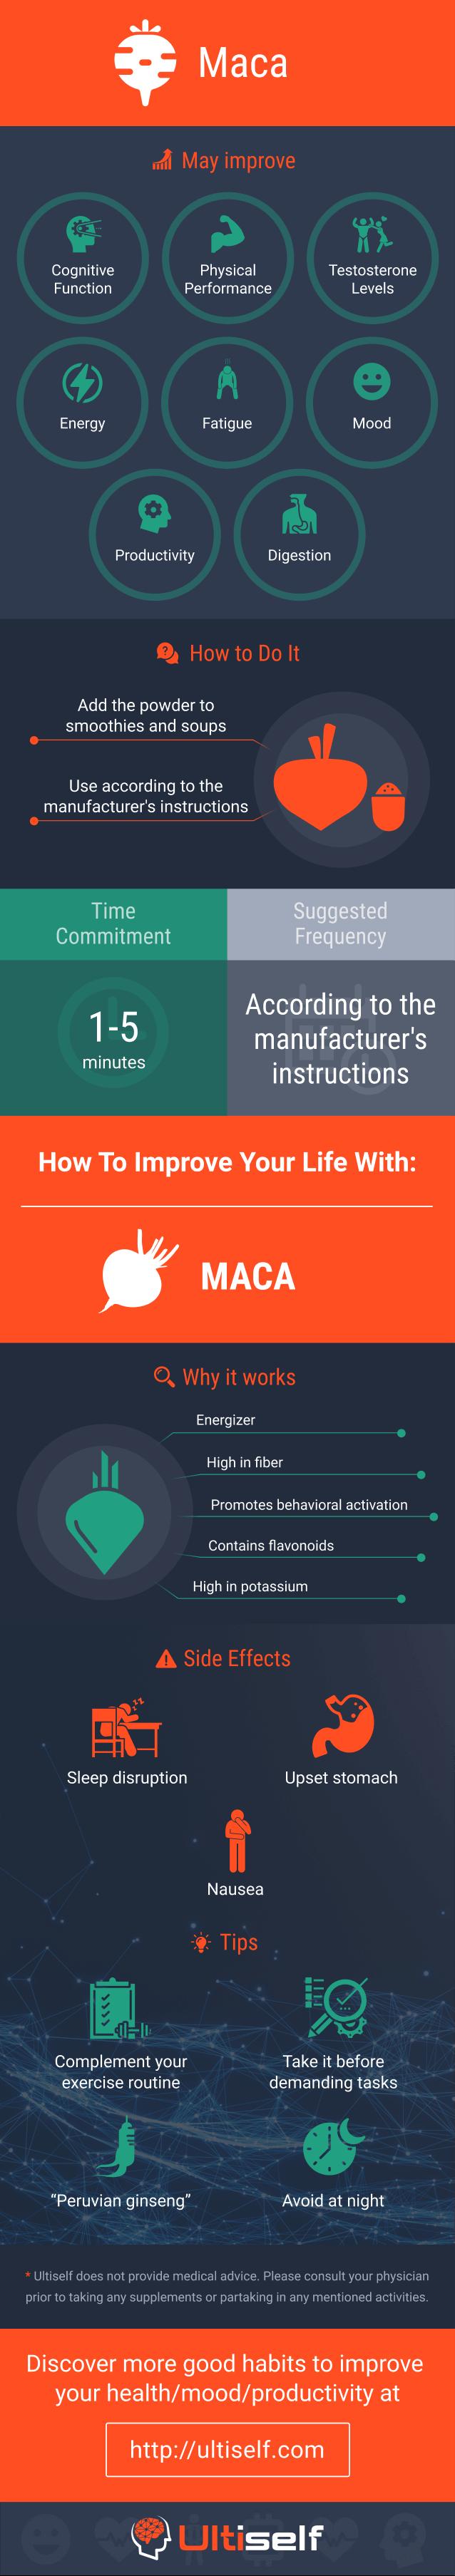 Maca infographic